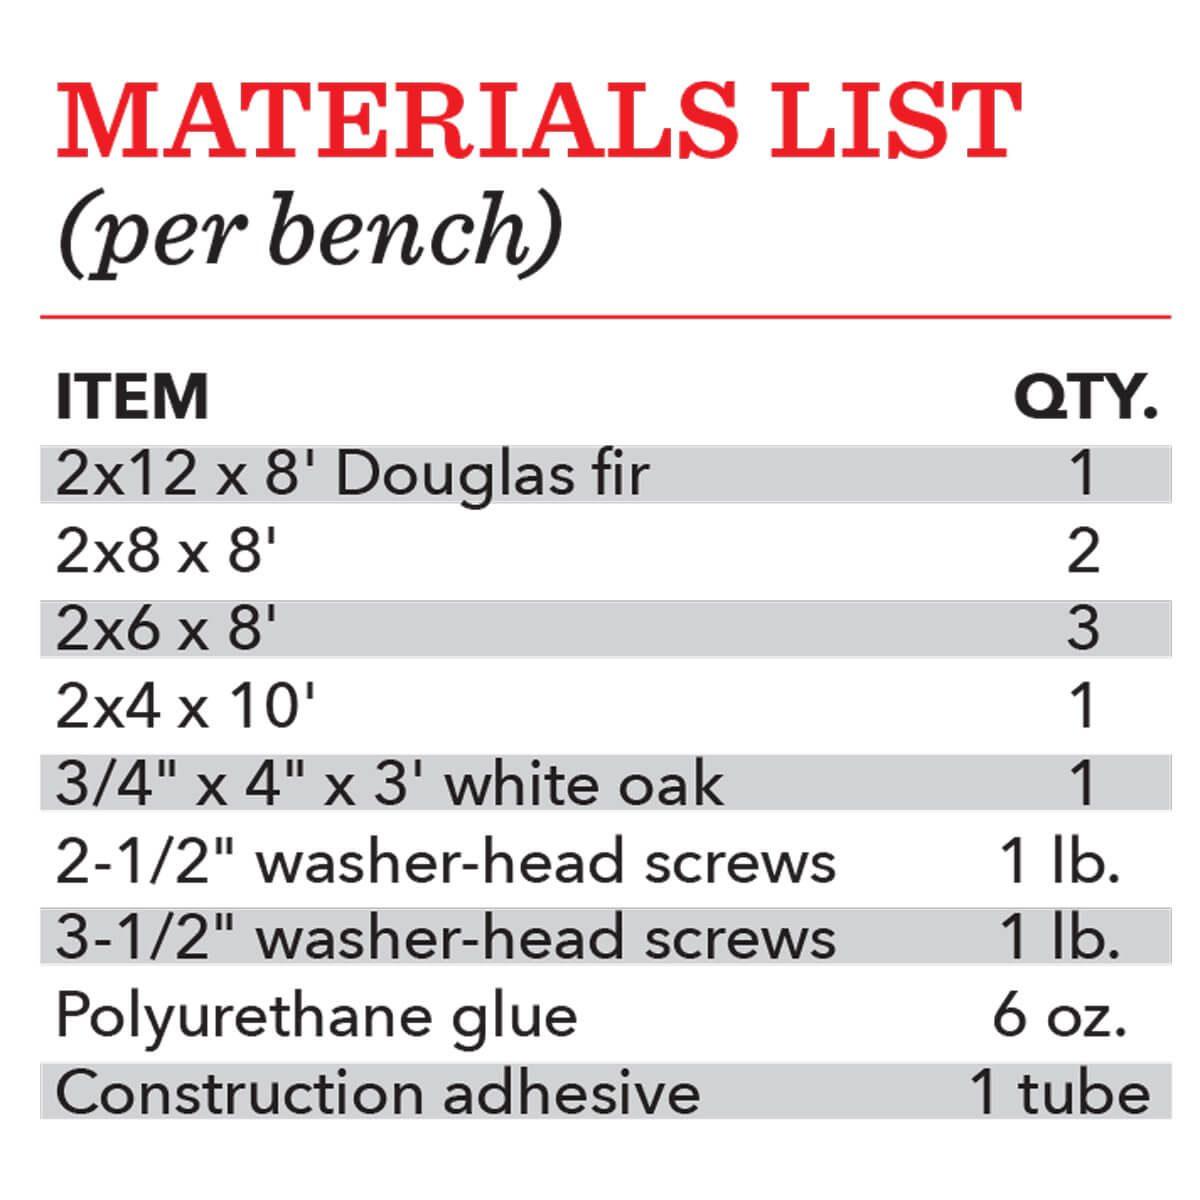 Heavy Duty Viking Bench The Family Handyman House Wiring Materials List